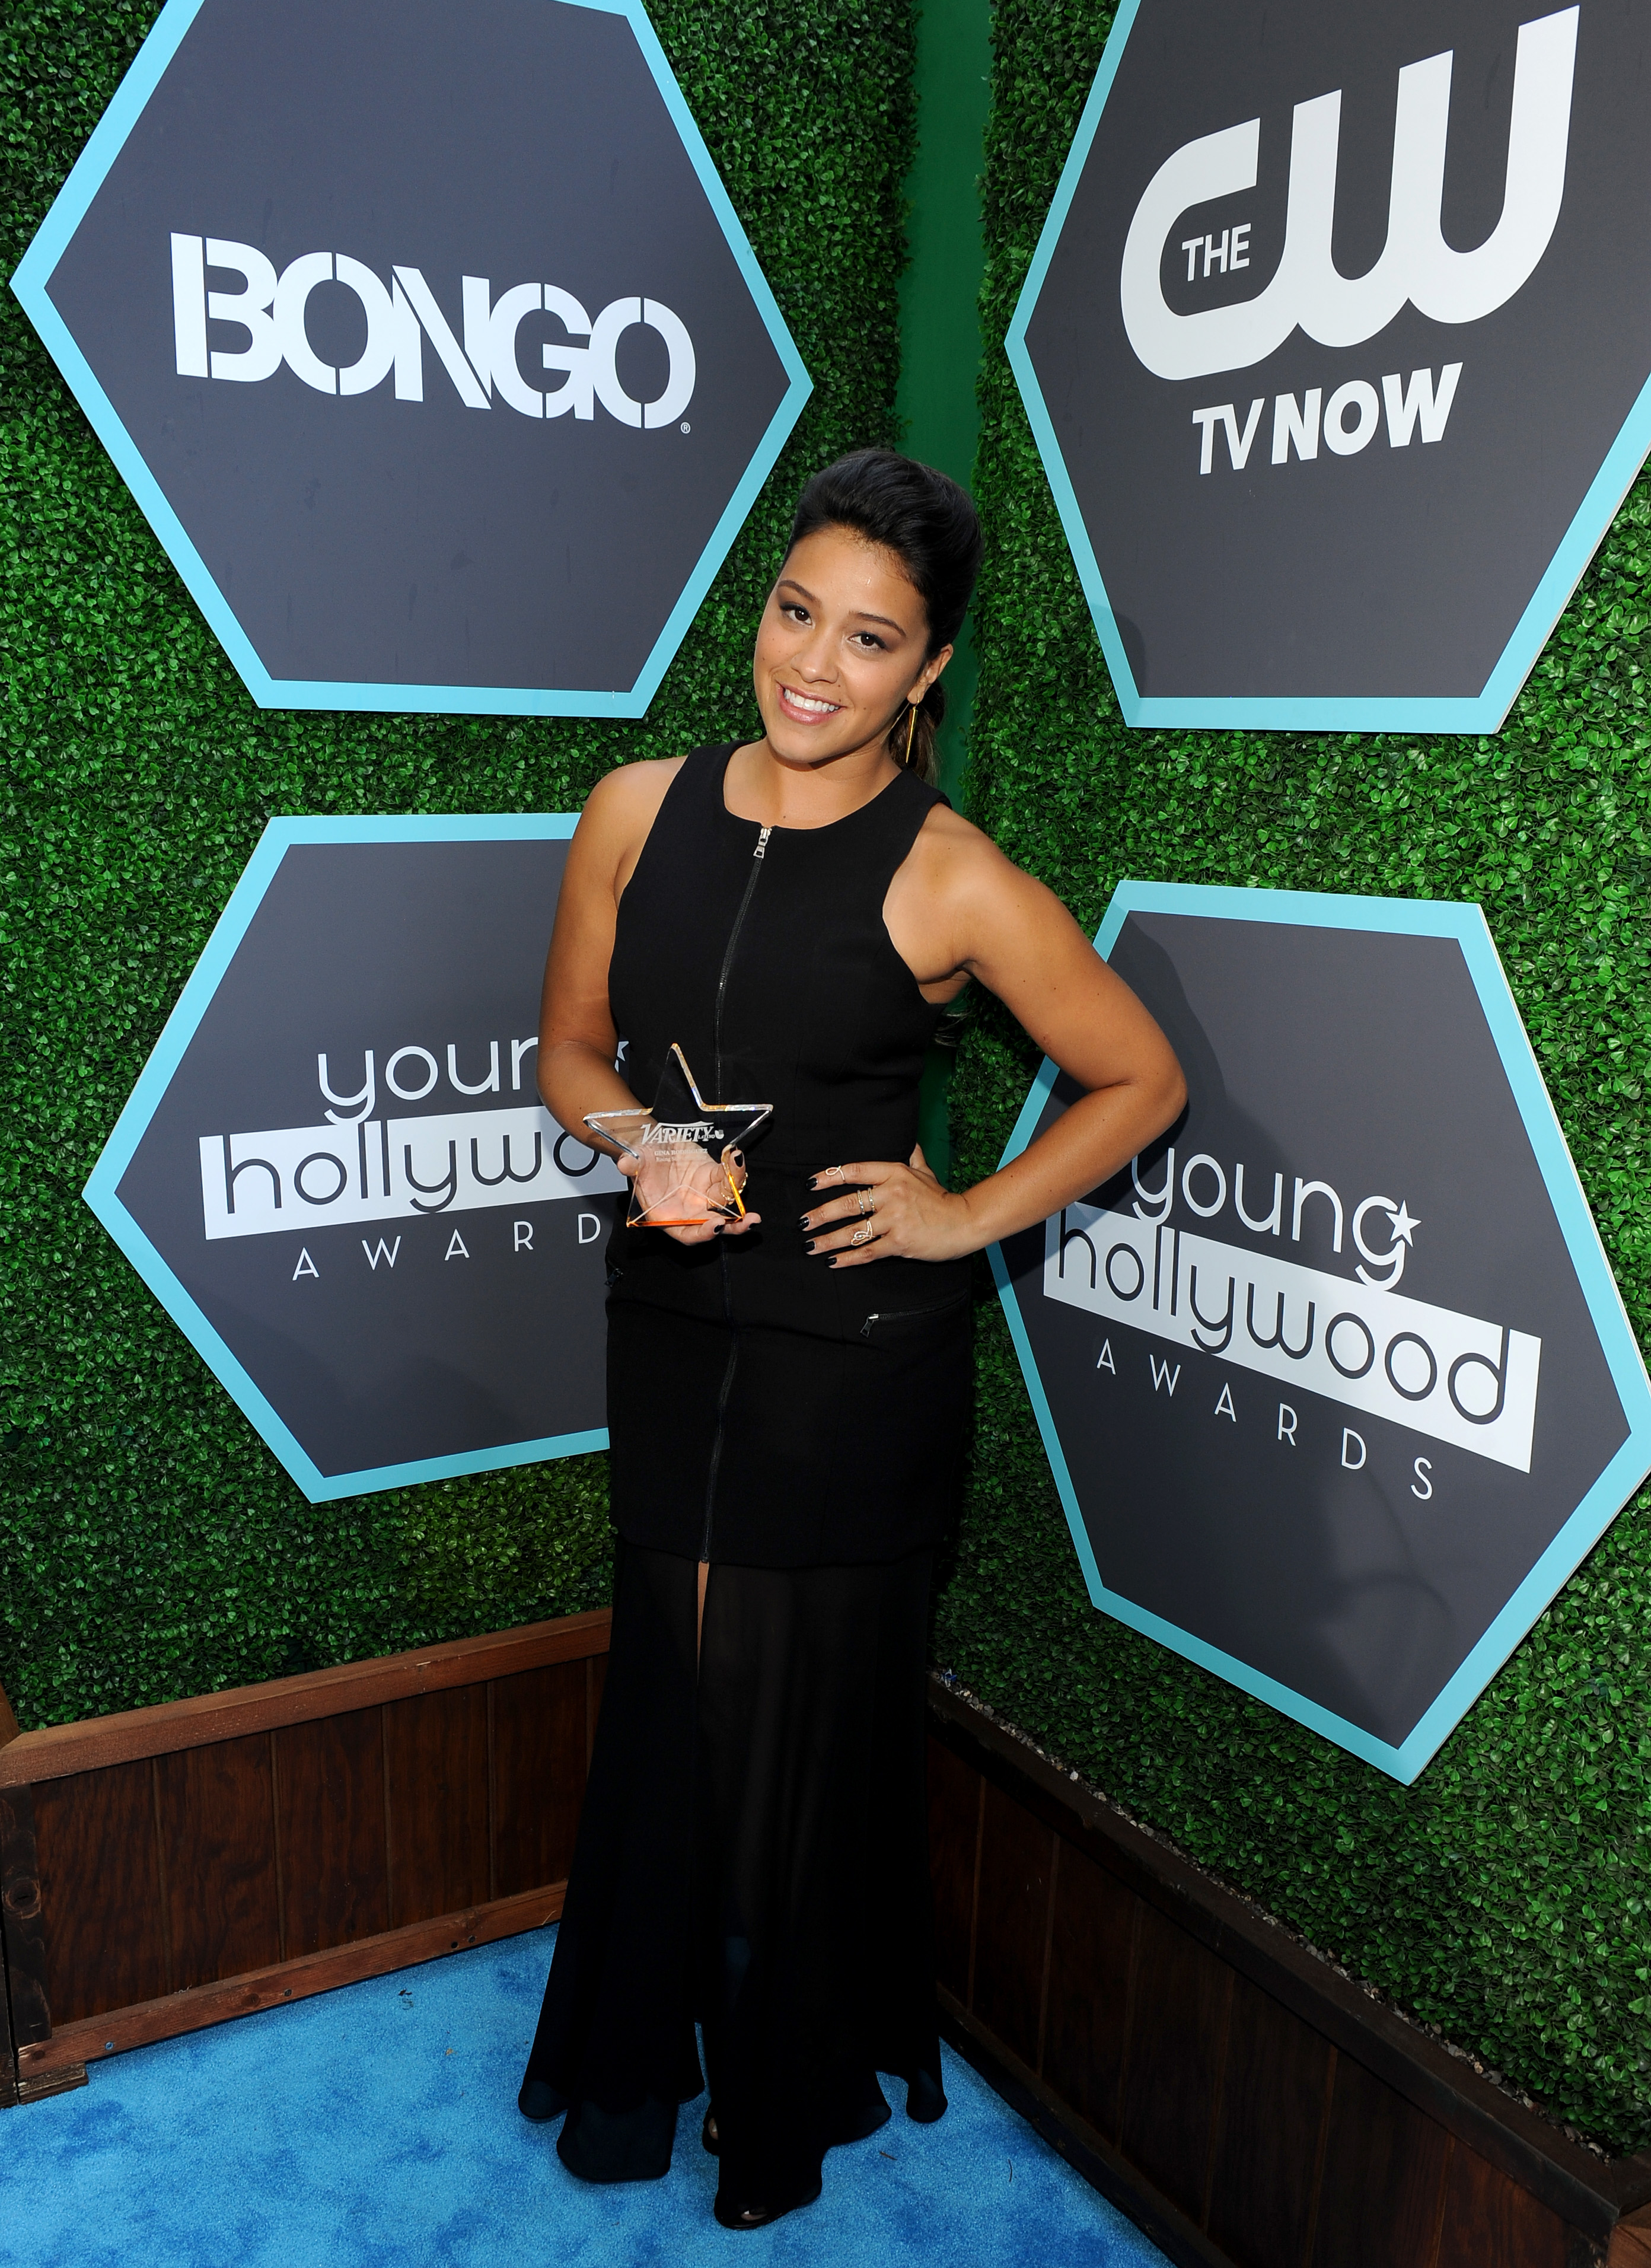 "<p>Gina se prepara para empezar a filmar ""Jane The Virgin,"" pero antes le dimos su premio que fue bien merecido. ¡No podemos esperar verla crecer como actriz y mujer! Te queremos Gina.</p><p><strong>VER TAMBIÉN: <a title=""Gina Rodriguez será premiada en los Young Hollywood Awards (VIDEO)"" href=""http://varietylatino.com/video/gina-rodriguez-young-hollywood-awards-video/"" target=""_blank"">Gina Rodriguez será premiada en los Young Hollywood Awards (VIDEO)</a></strong></p>"